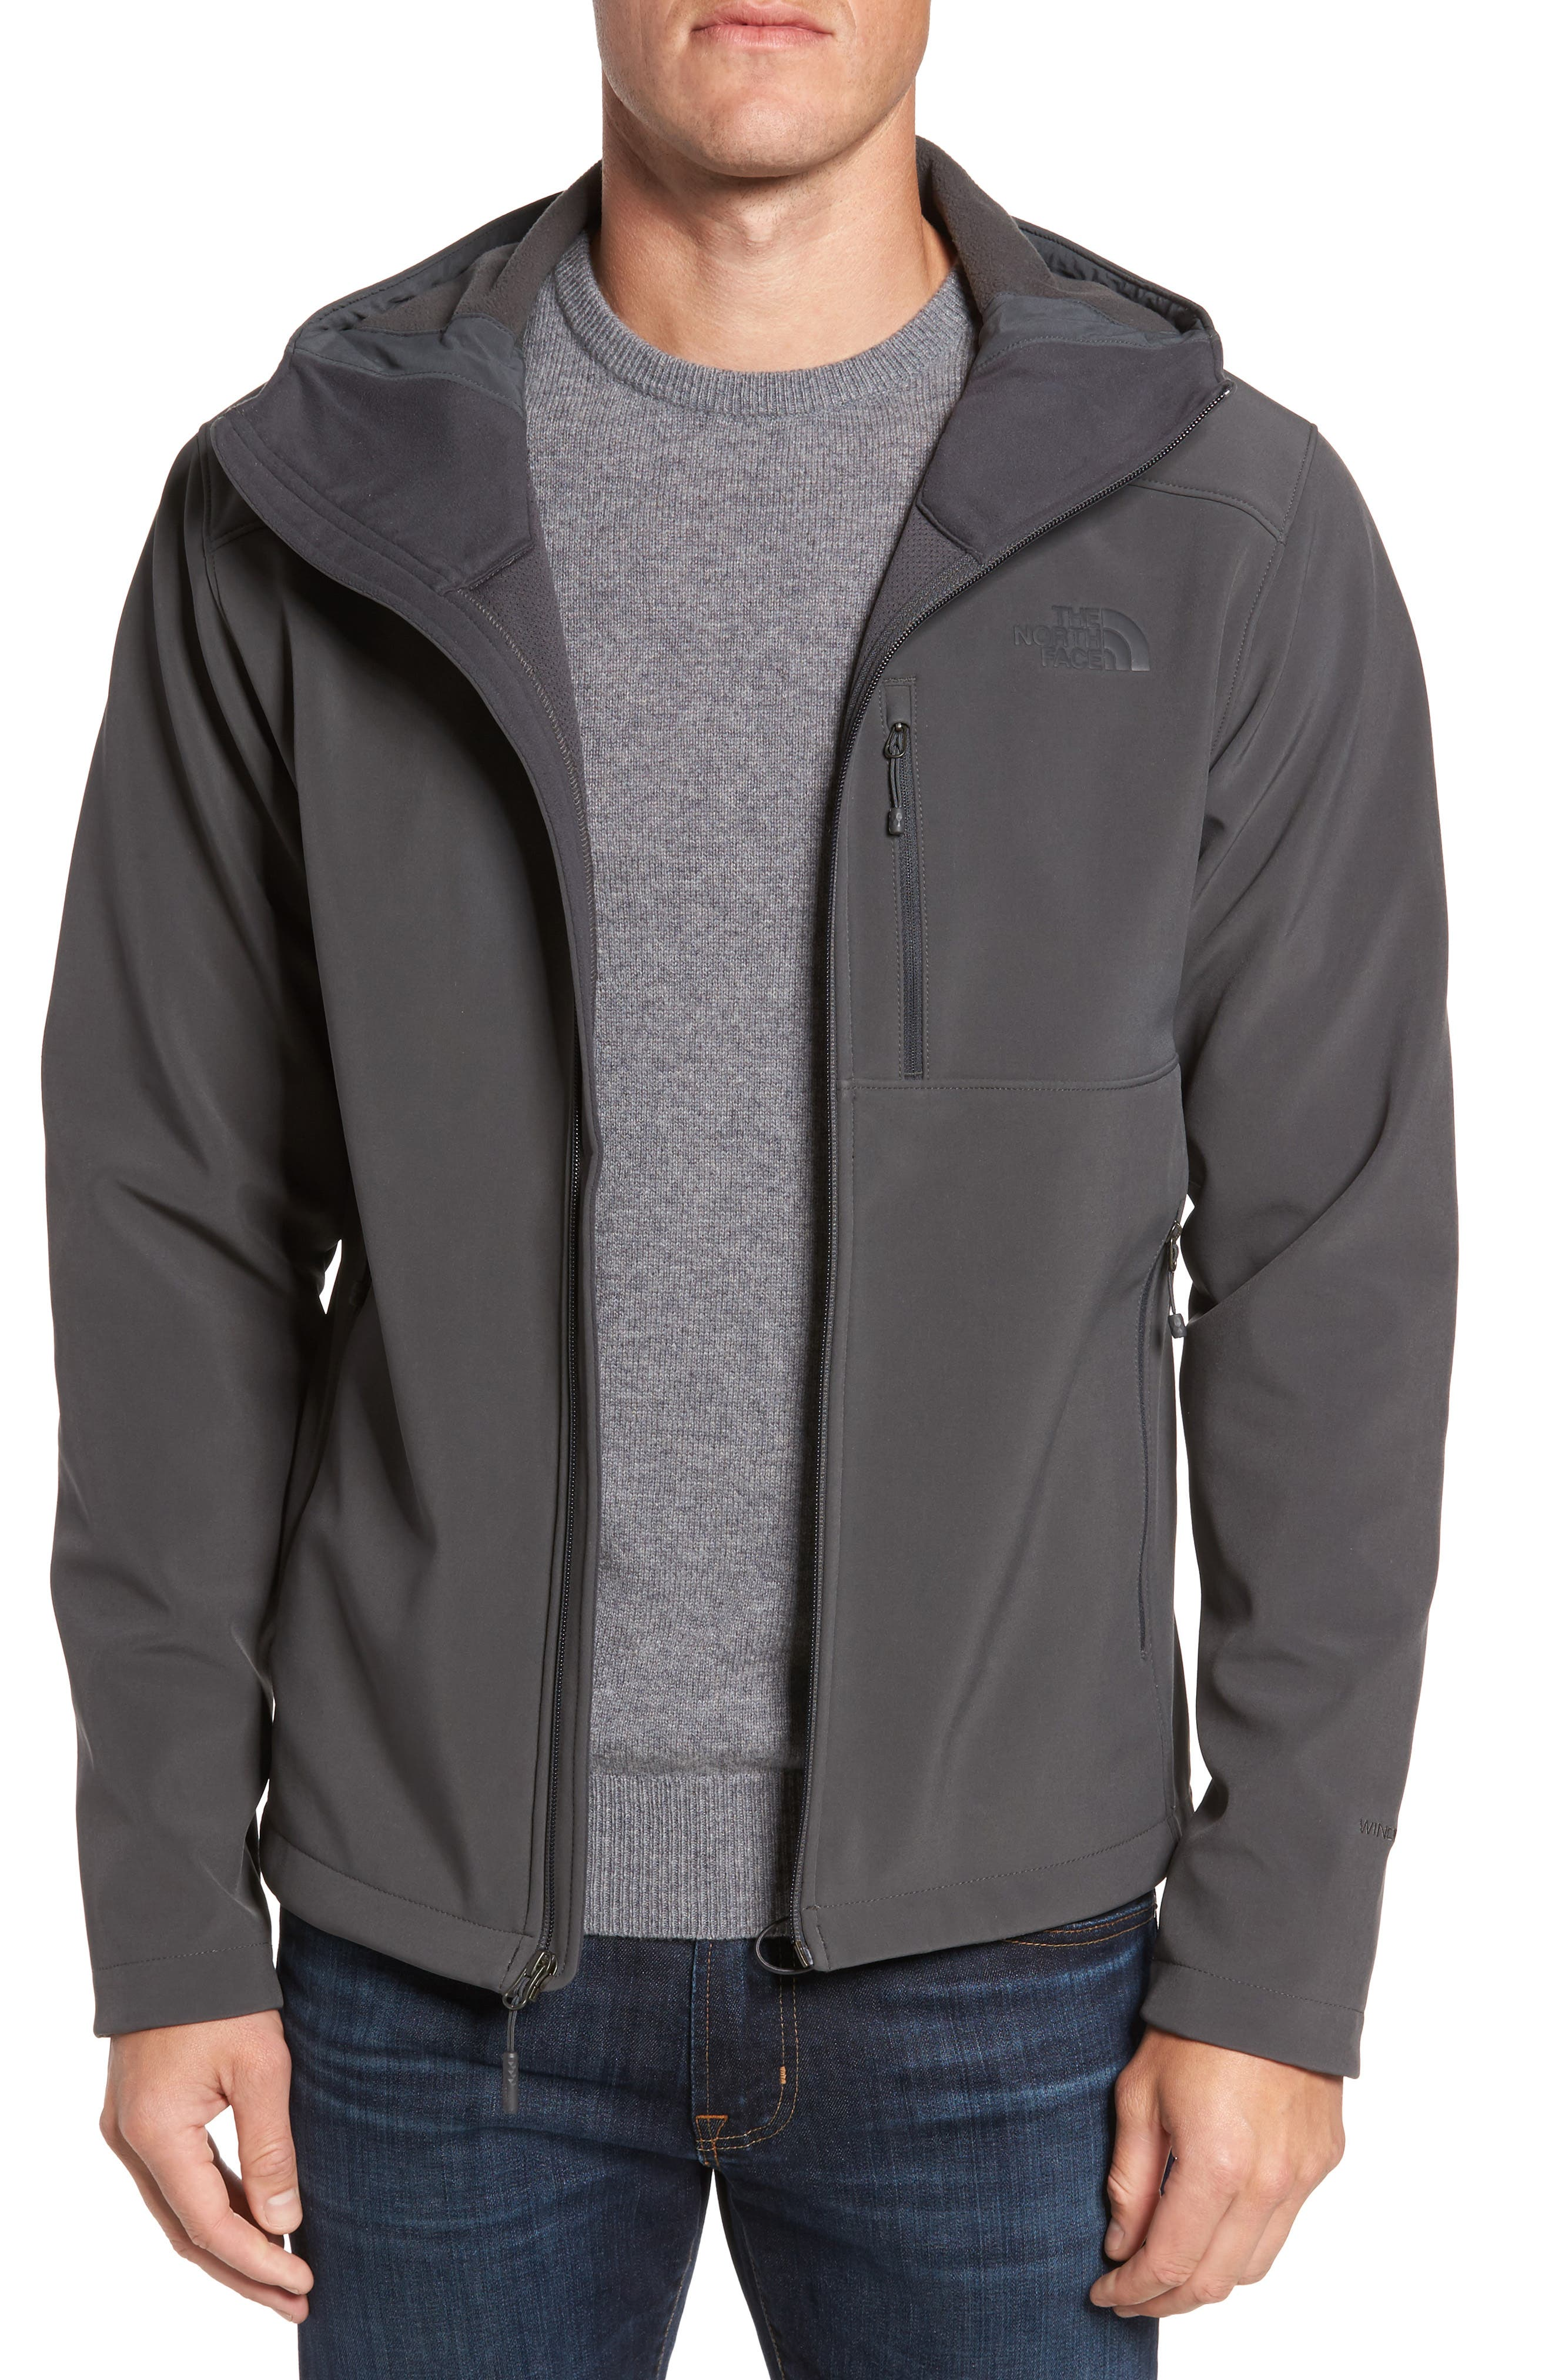 Apex Bionic 2 Water Repellent Jacket,                         Main,                         color, Grey